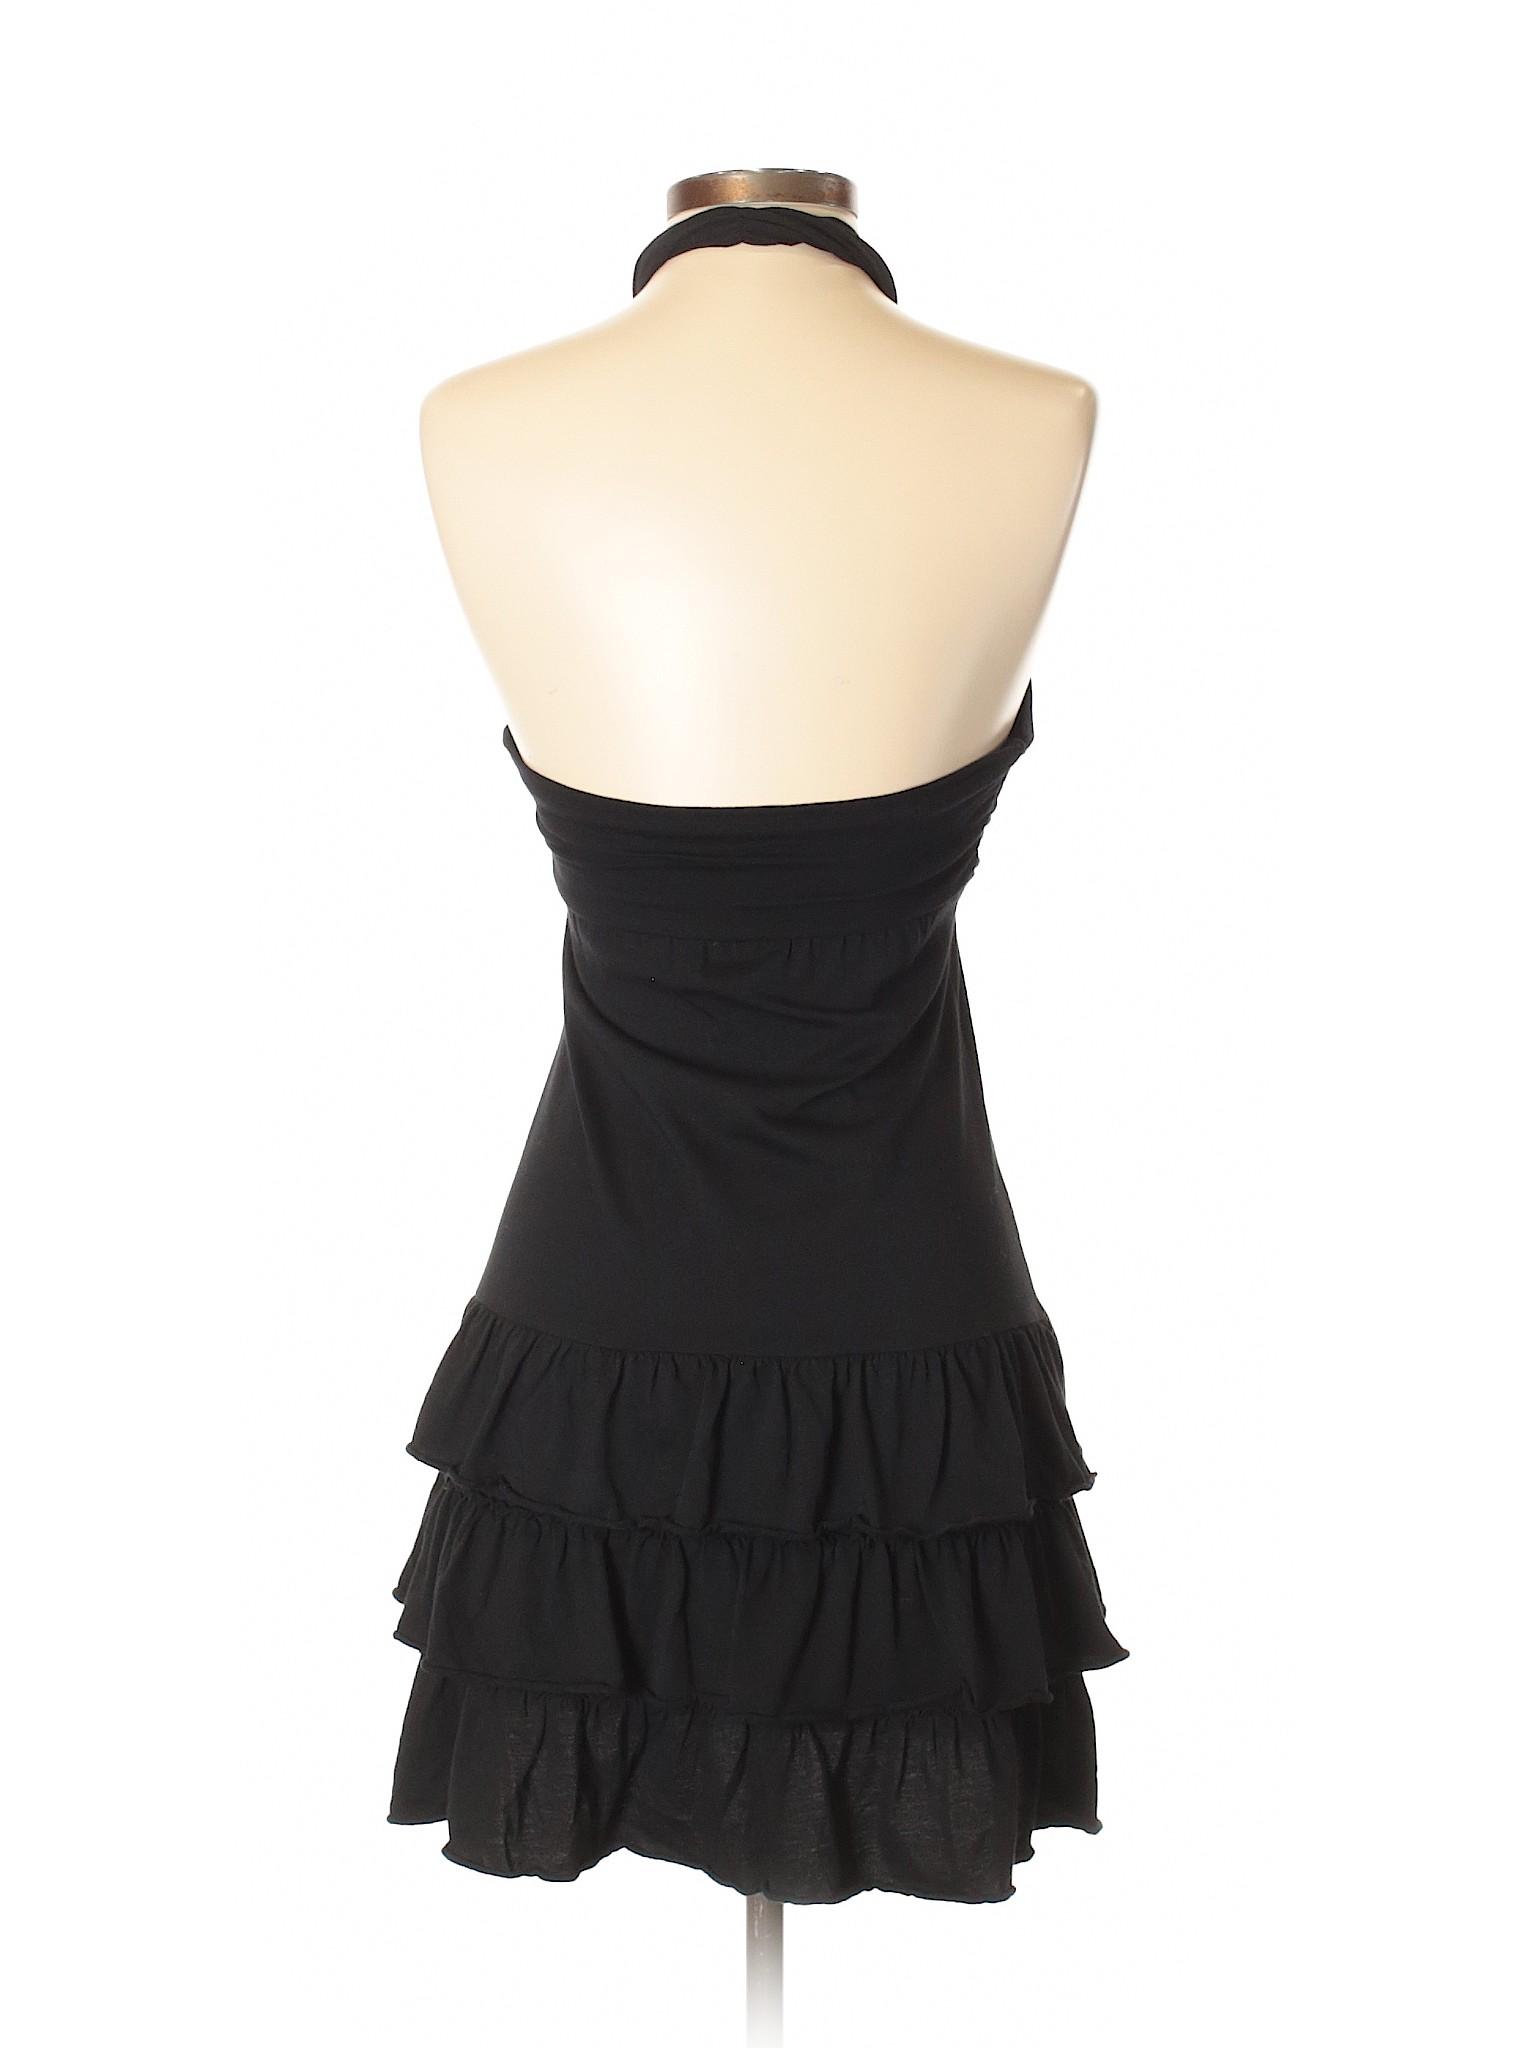 Boutique Express winter winter Casual Dress Boutique rF0xwrTqU8